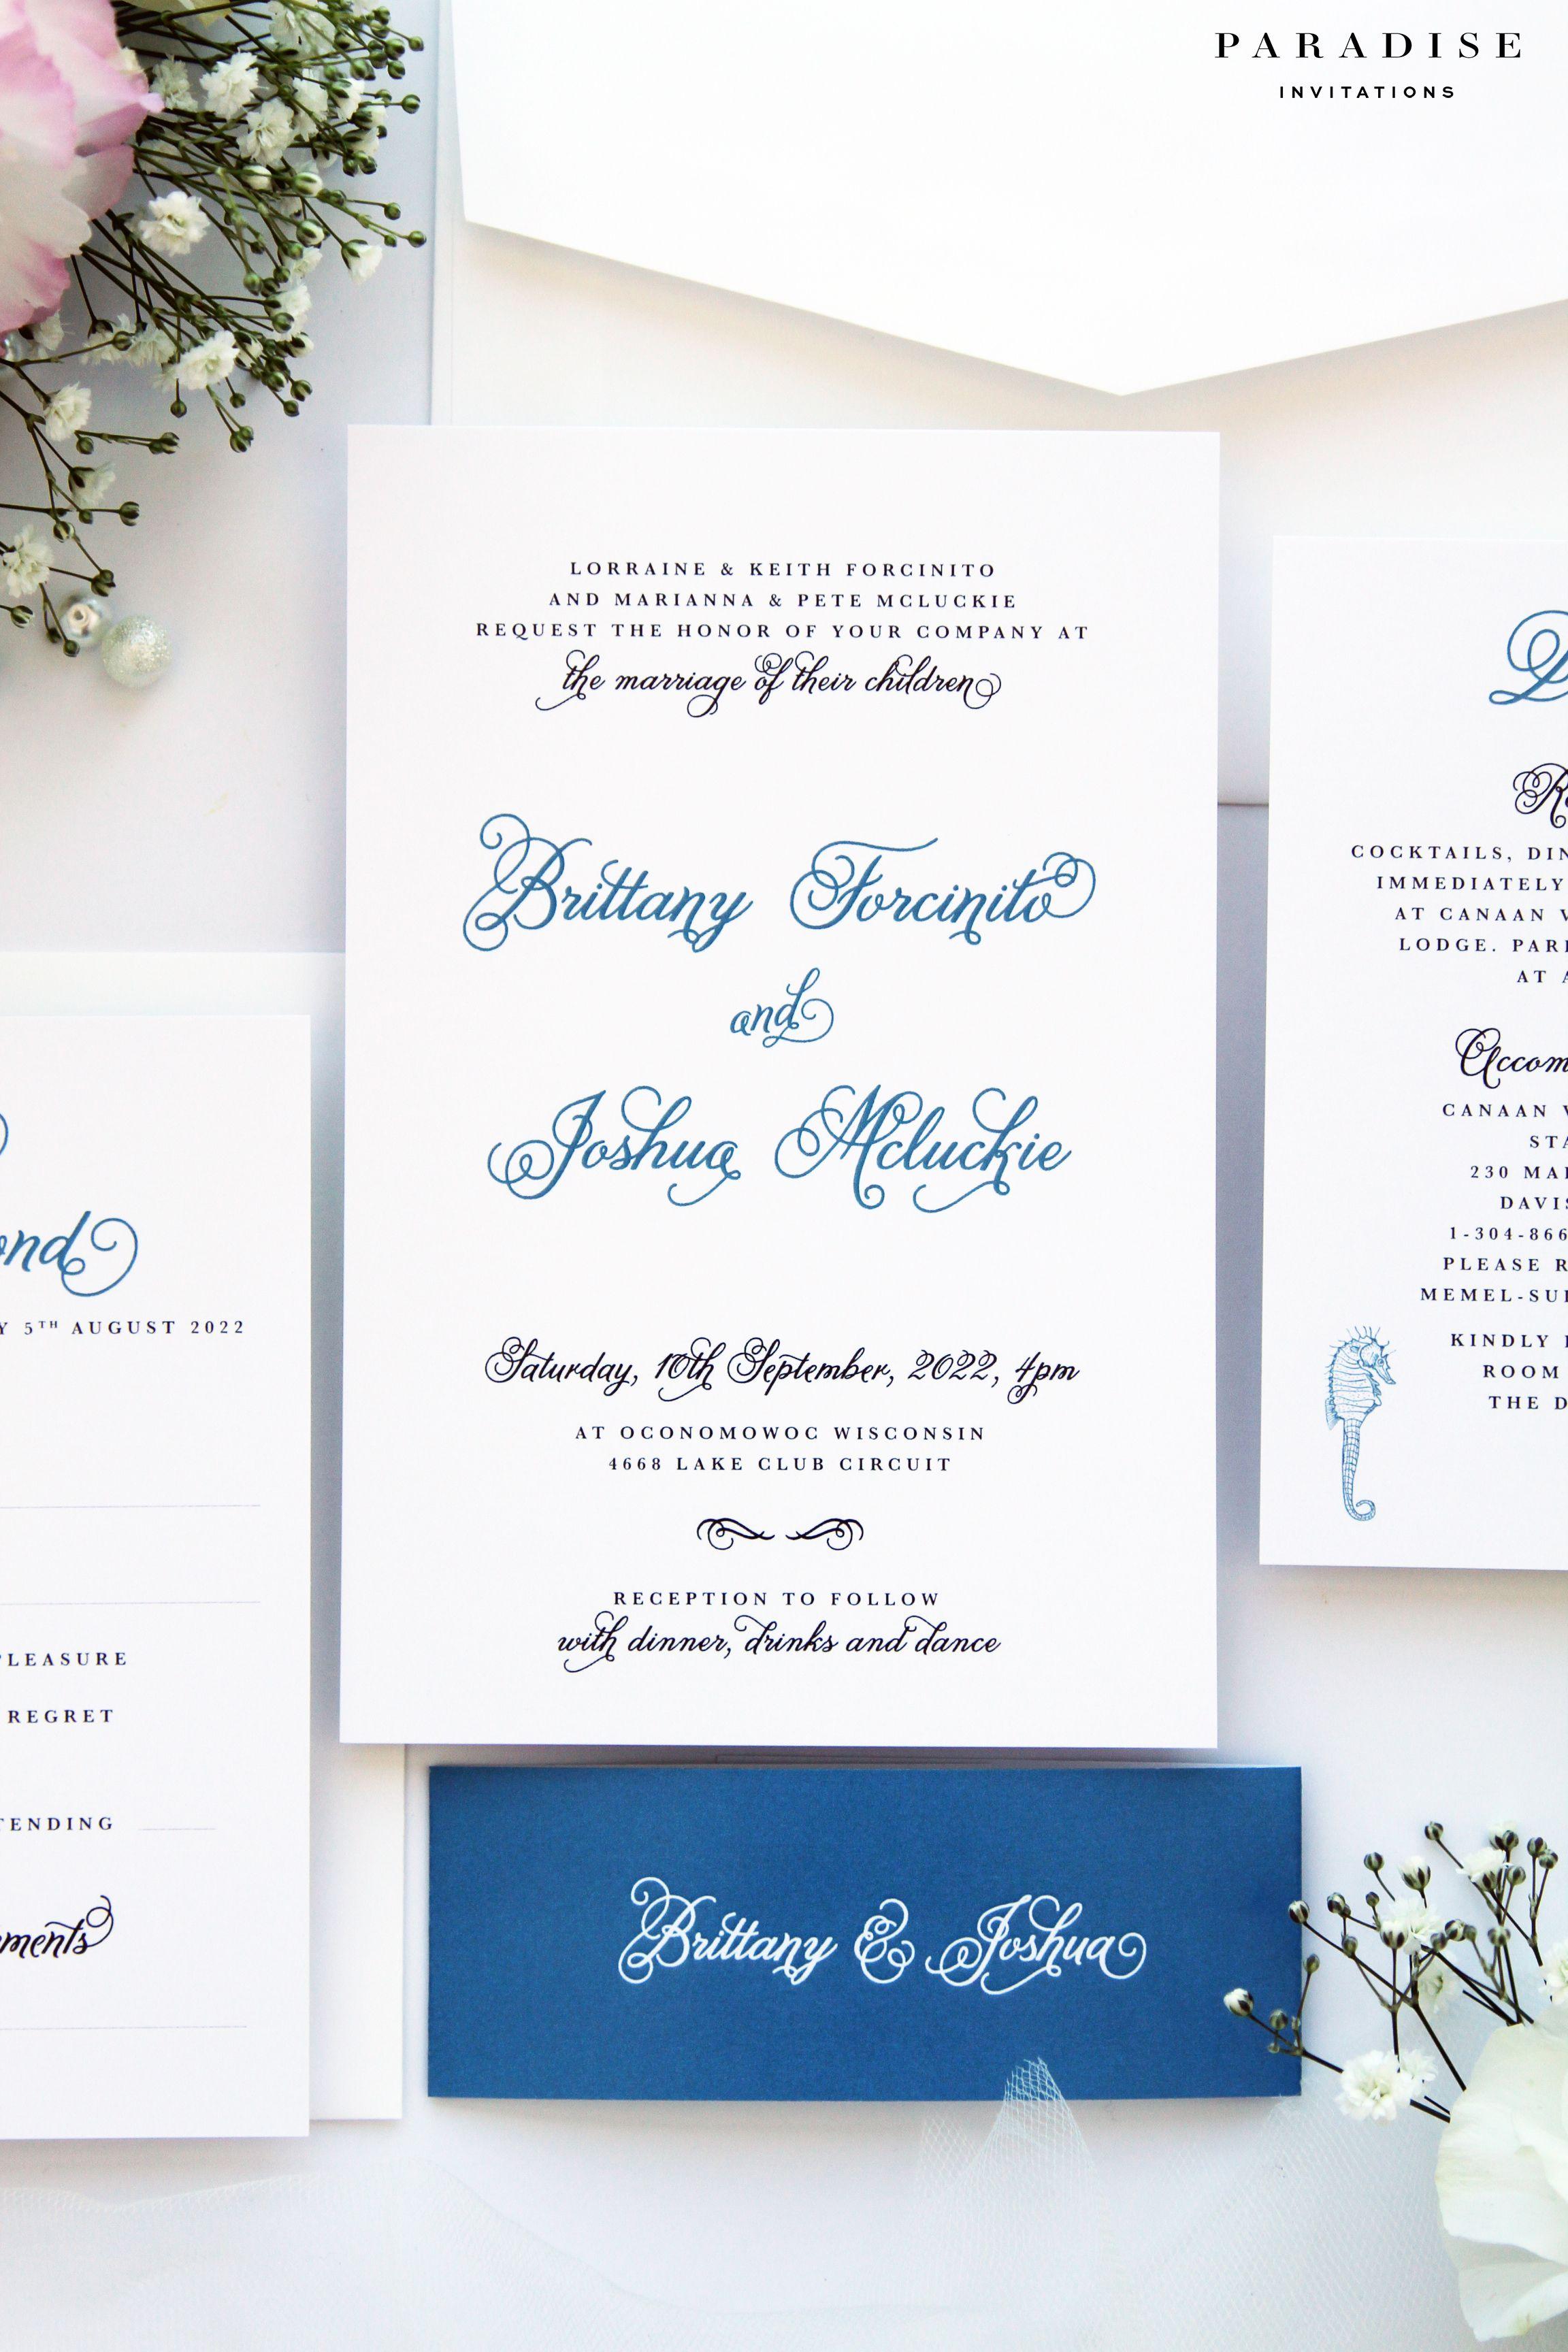 Brianna Beach Sea Wave Wedding Invitation Sets Modern Calligraphy